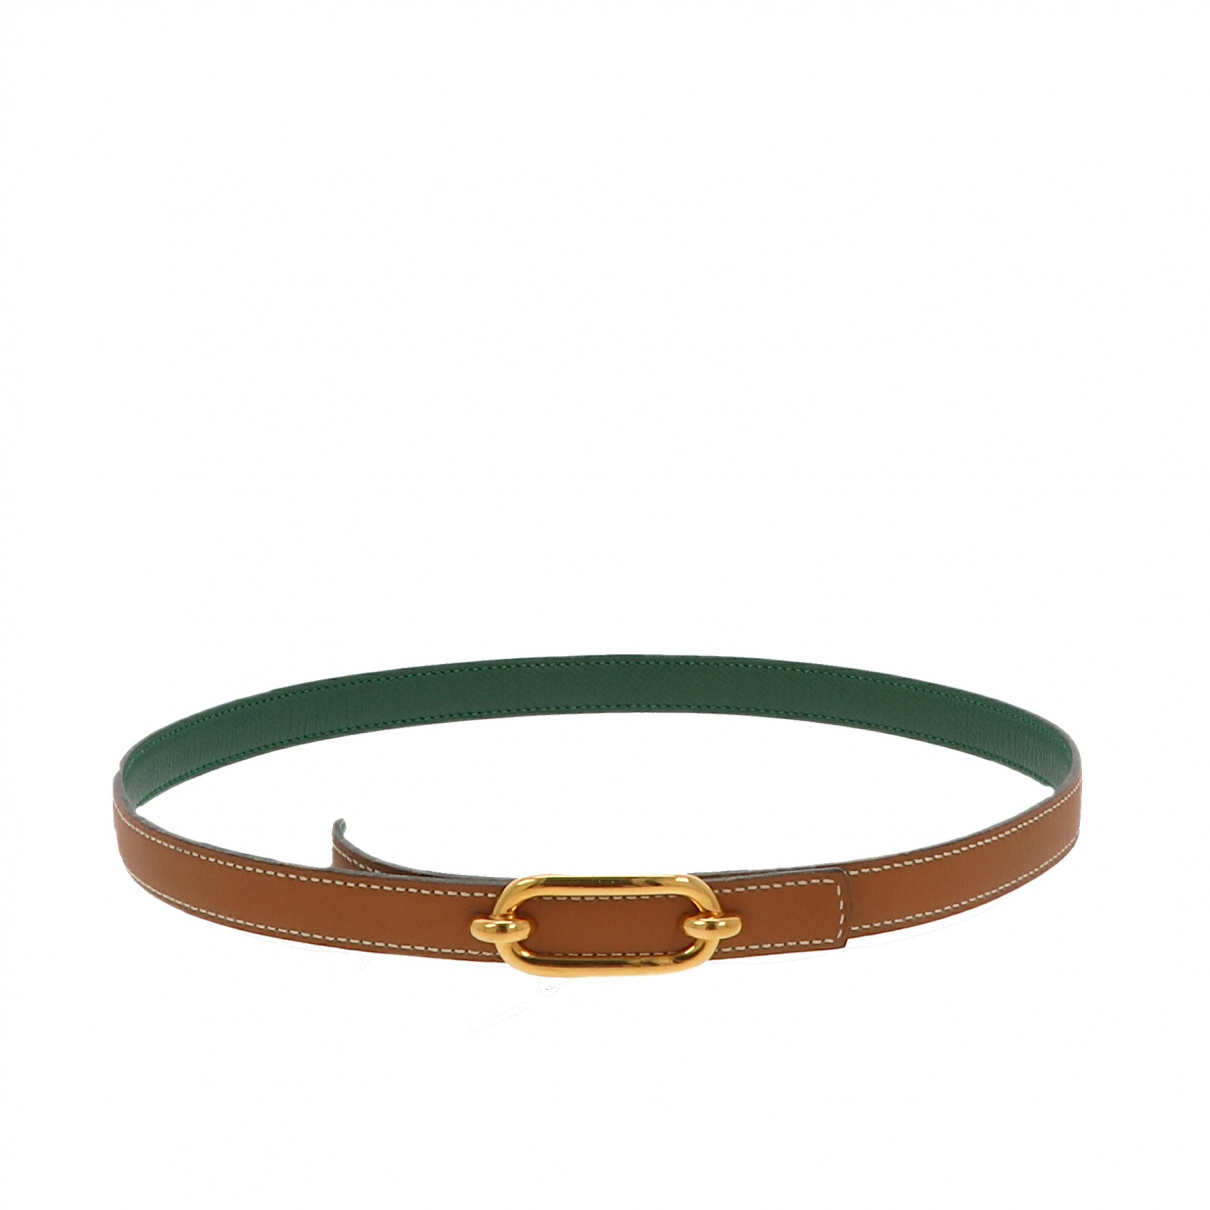 Hermès N Brown Leather belt for Women 70 cm